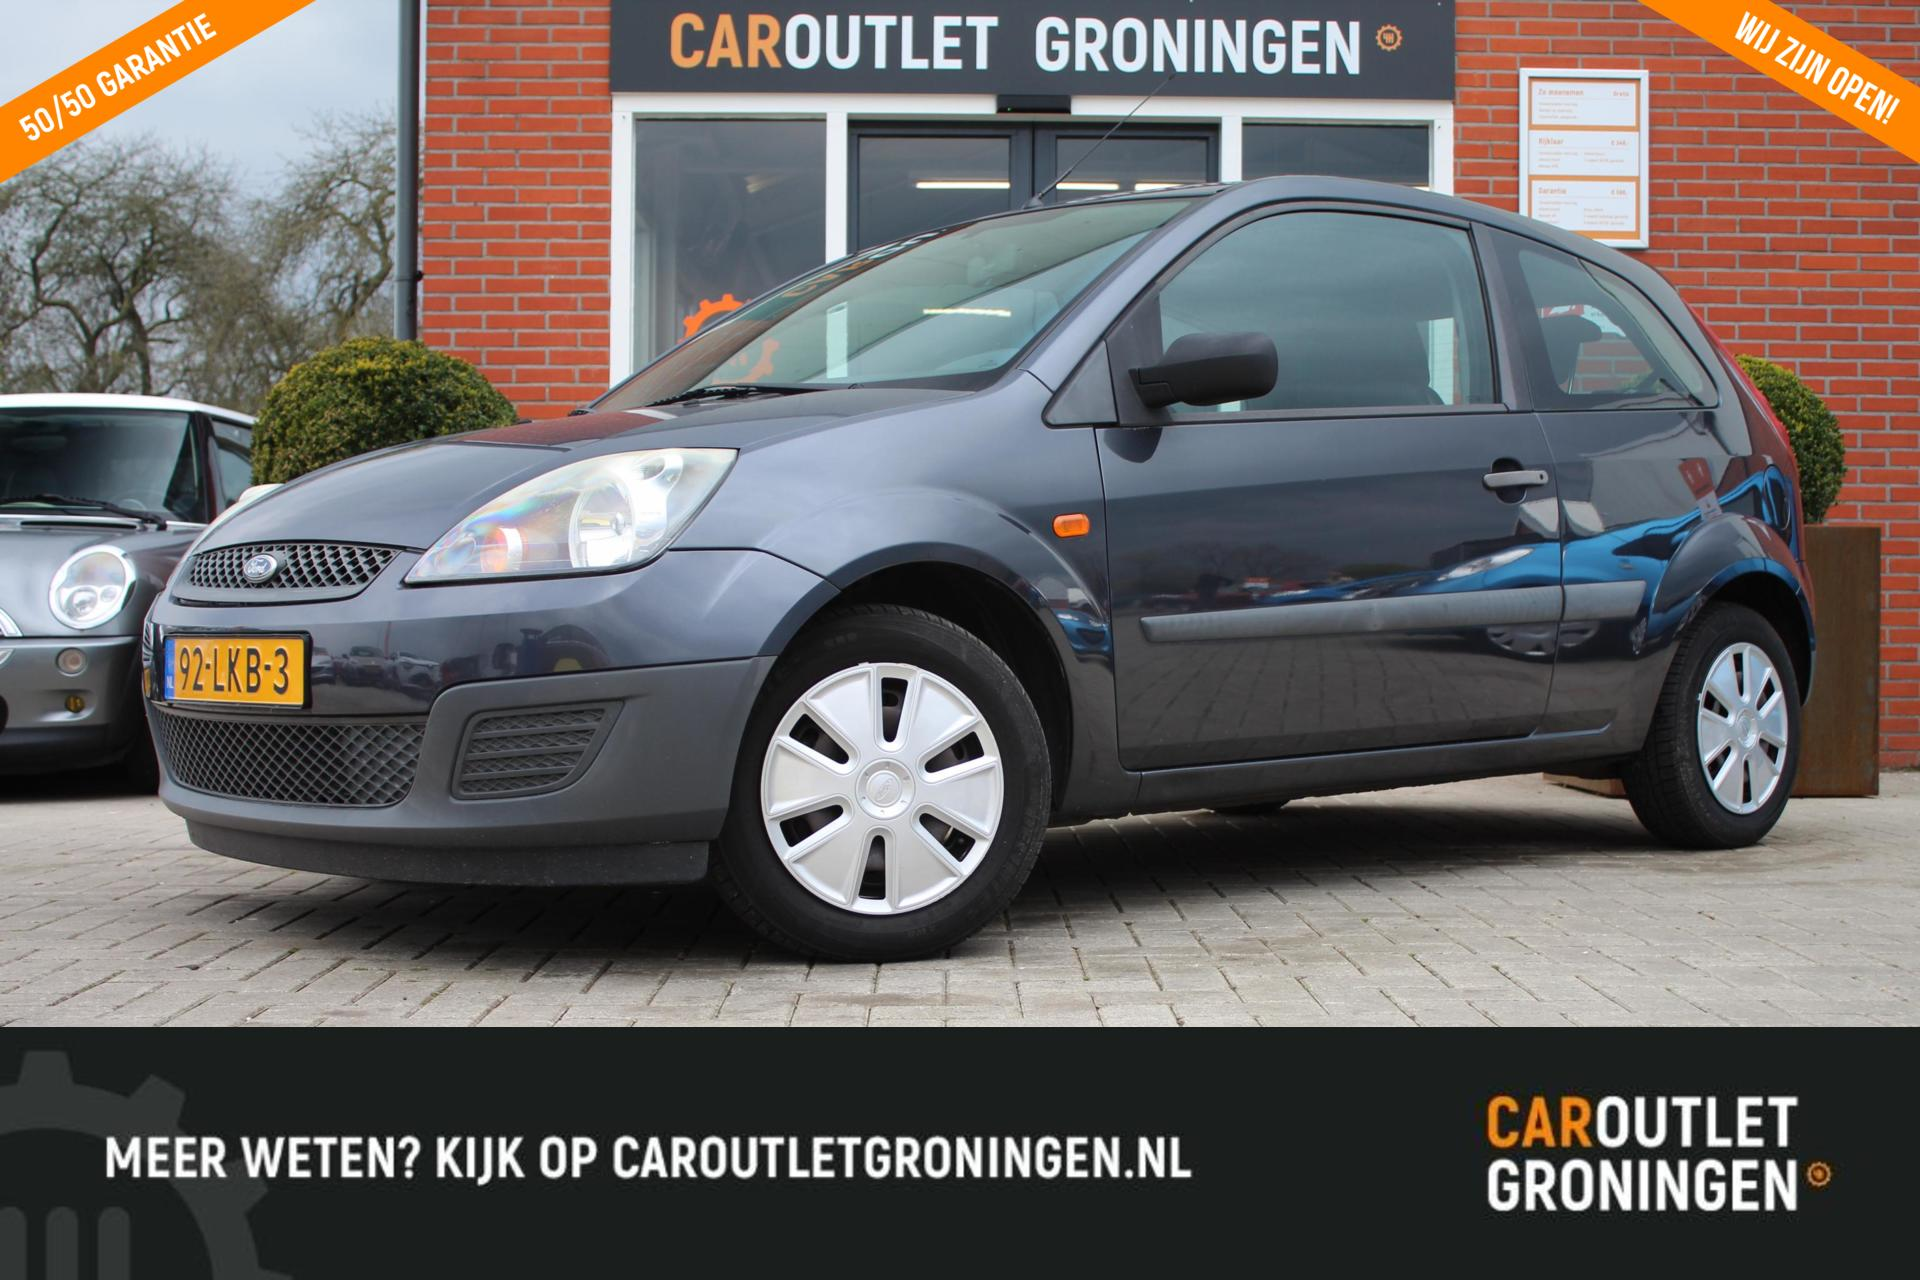 Caroutlet Groningen - Ford Fiesta 1.3-8V Style   NET BINNEN  